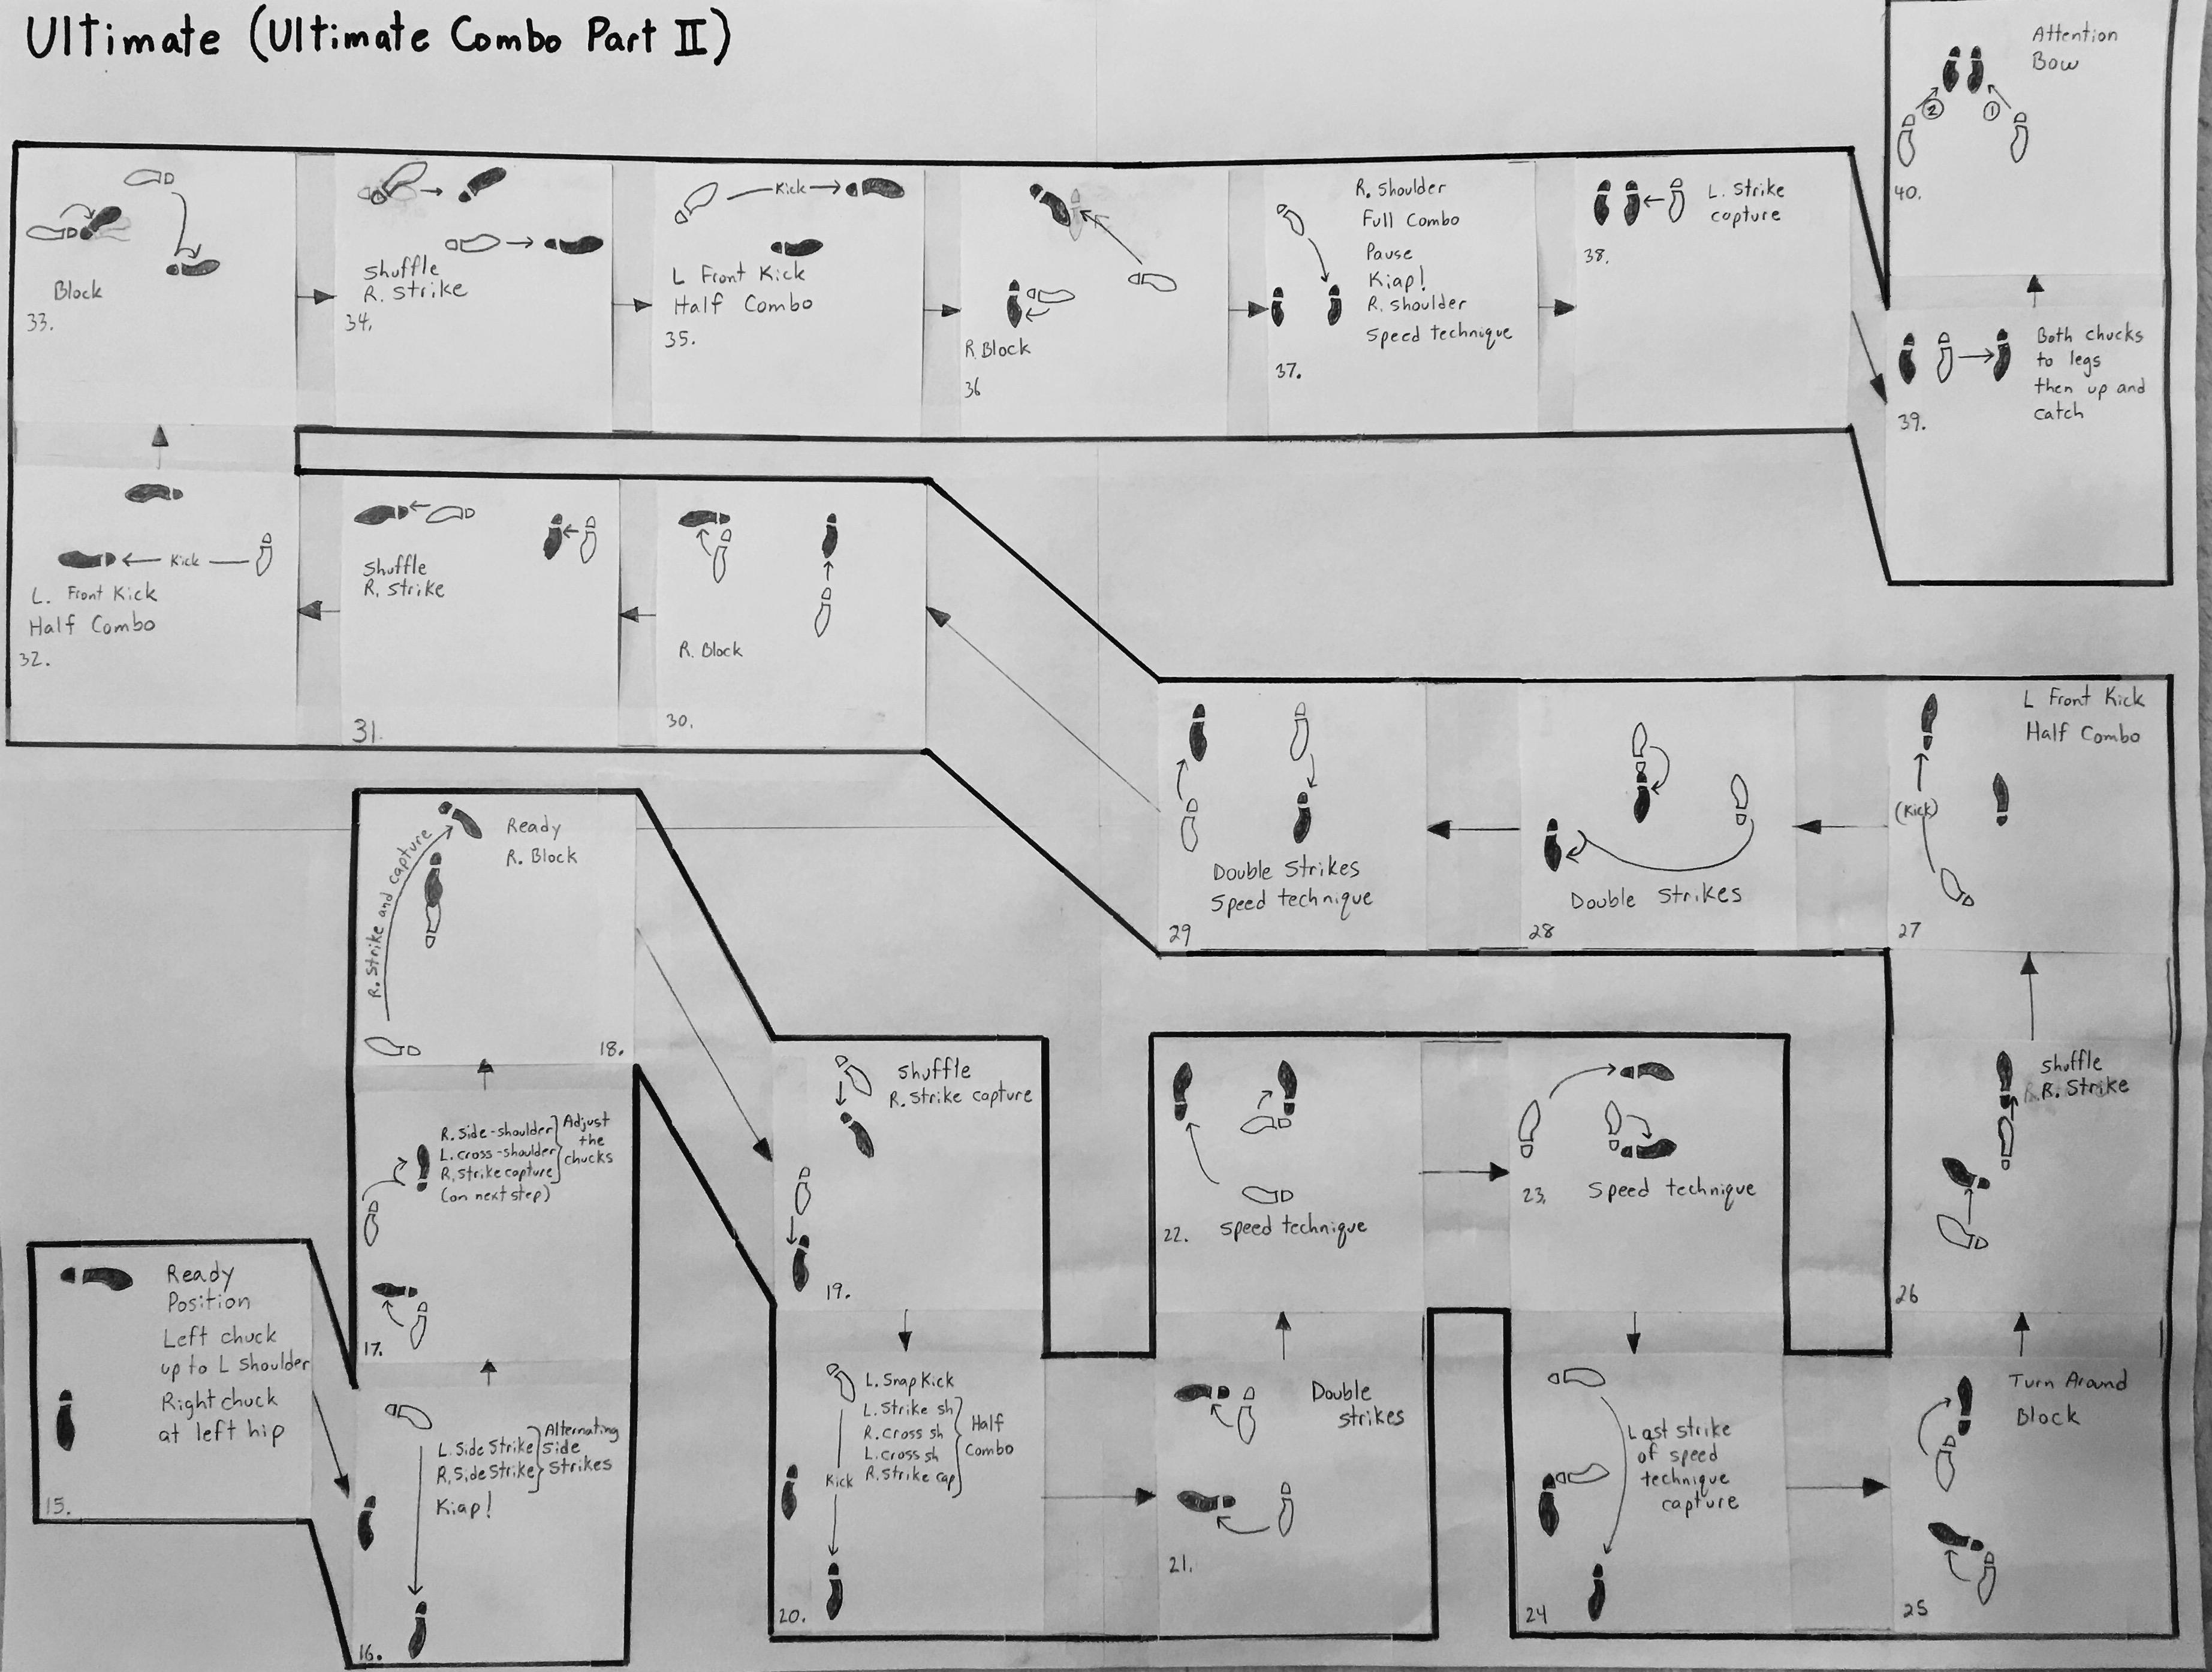 Ultimate Combo Part 2 Diagram